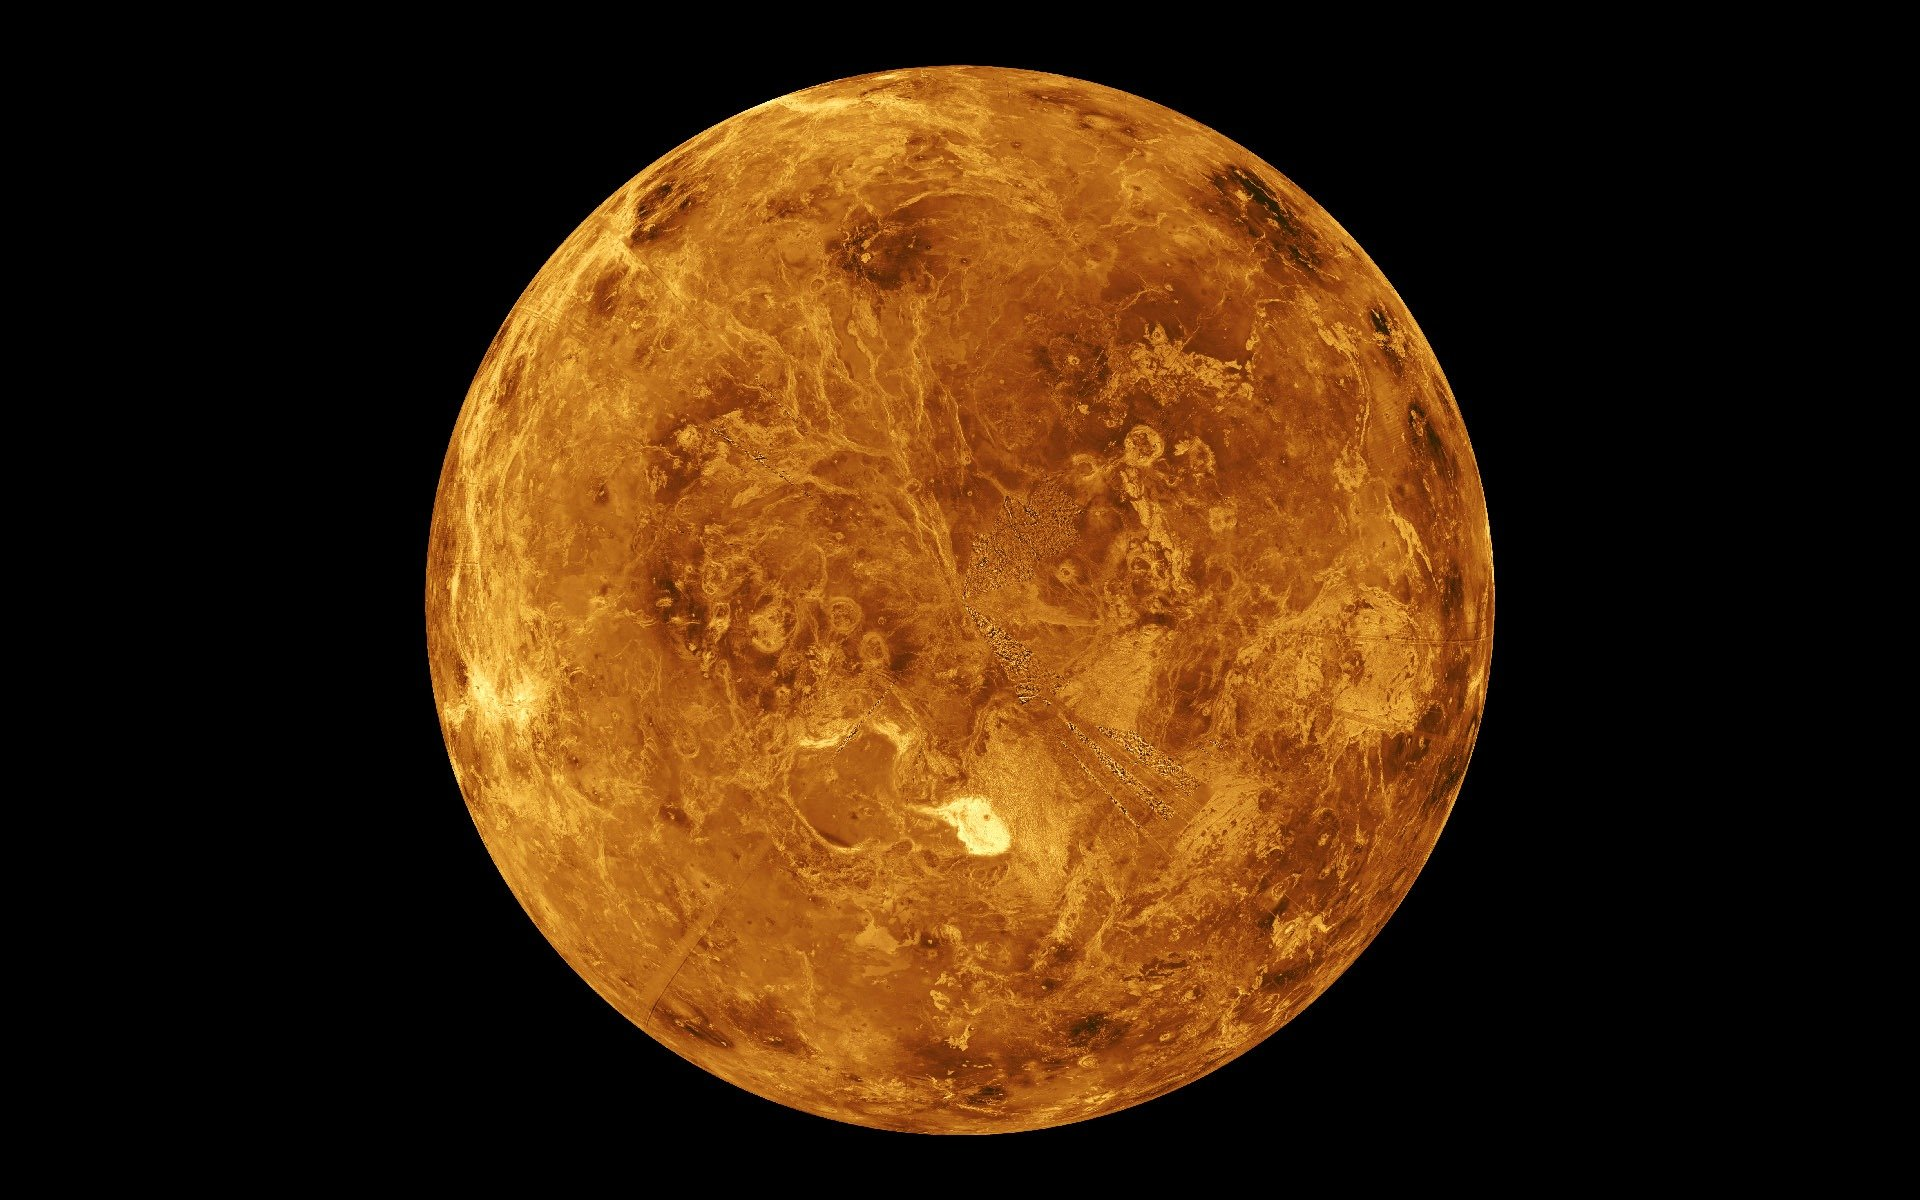 Venus HD Wallpaper Background Images 1920x1200